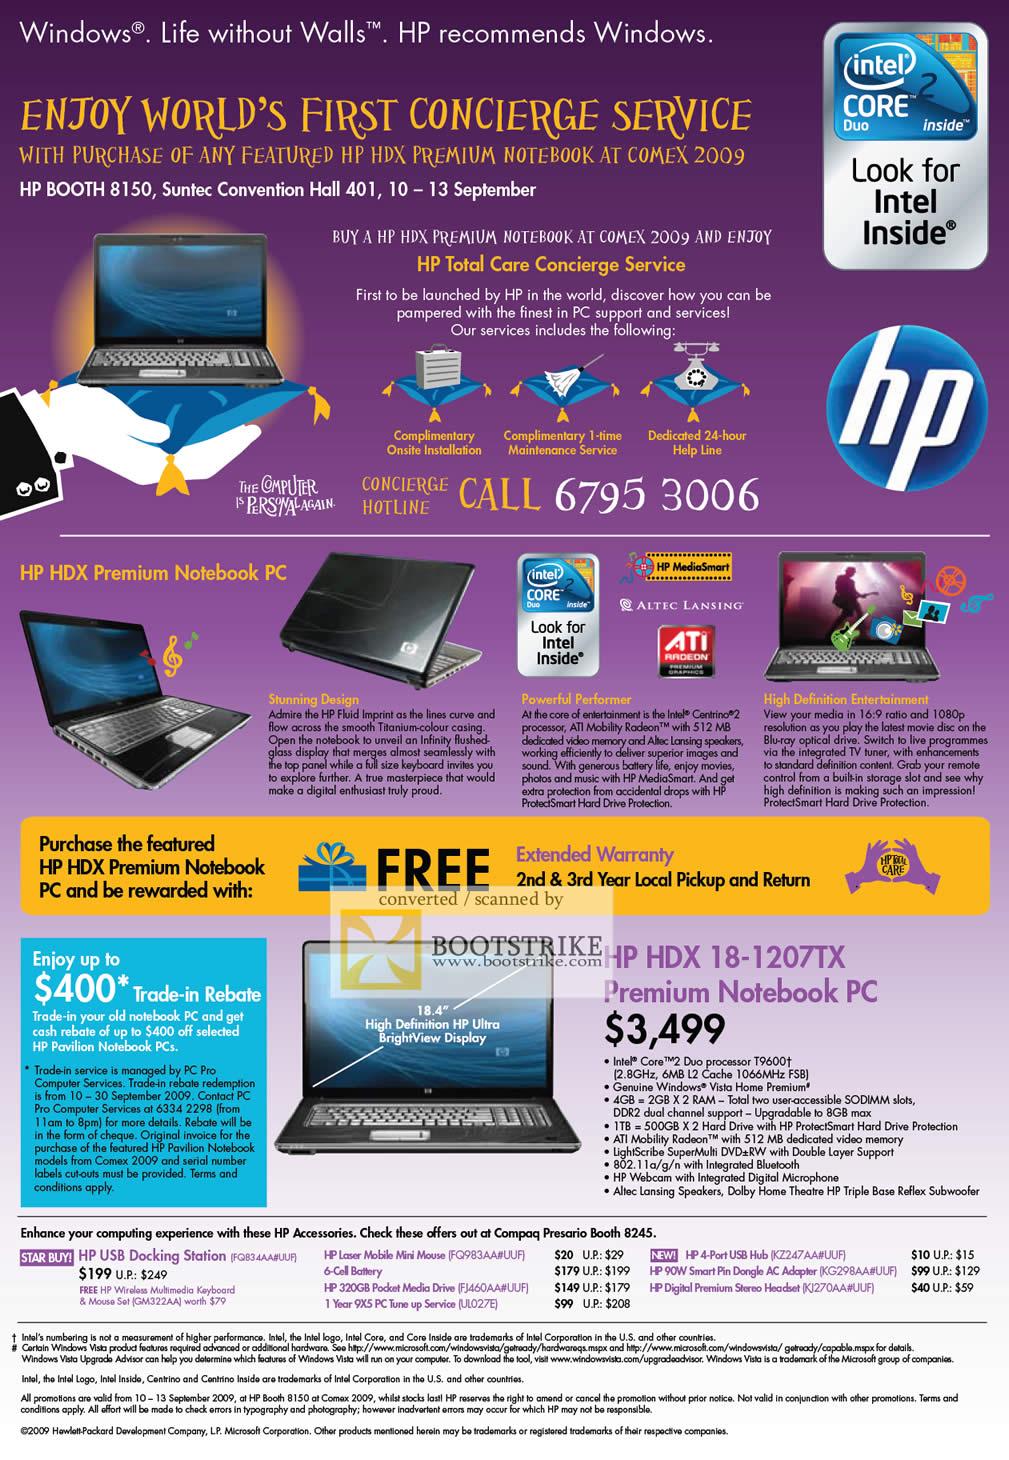 Comex 2009 price list image brochure of HP Concierge HDX 18-1207tx Premium Notebook PC